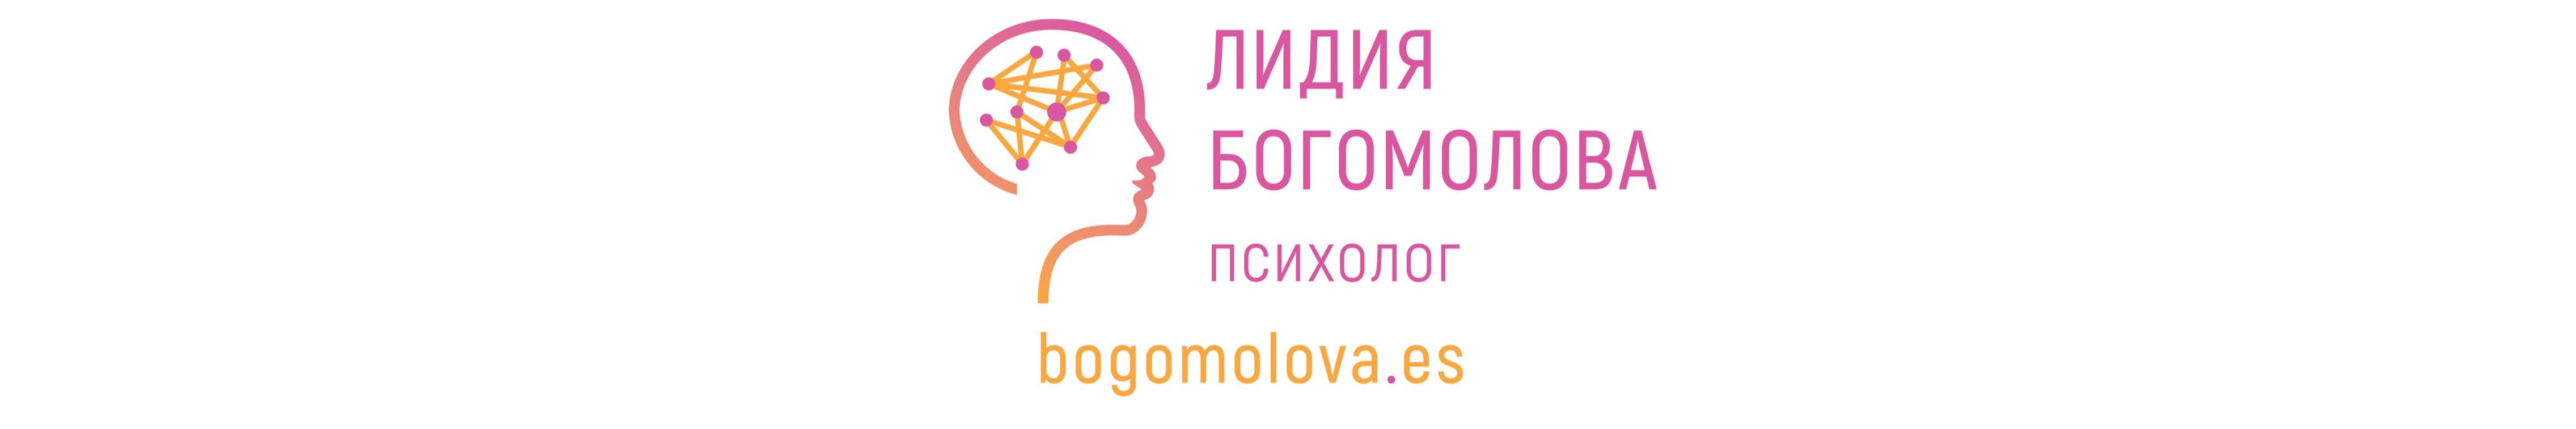 Lidia Bogomolova - ваш психолог в Испании